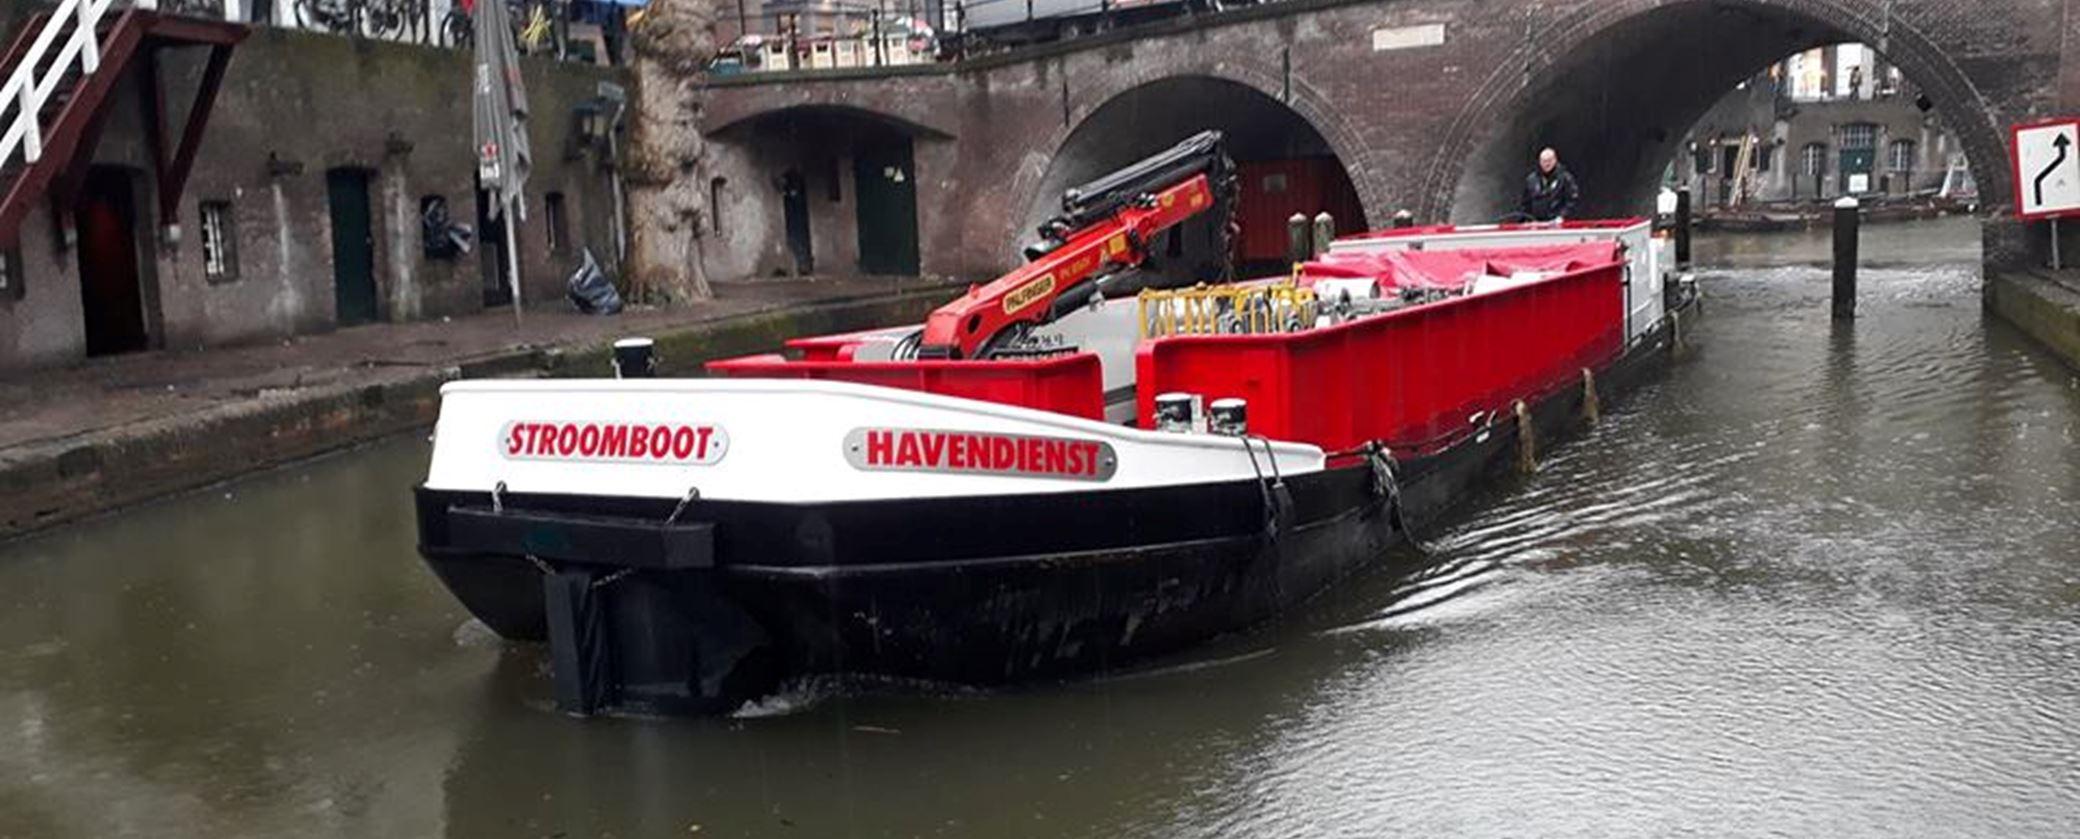 Pilot project: The Beerboat, Utrecht, Interreg VB North Sea